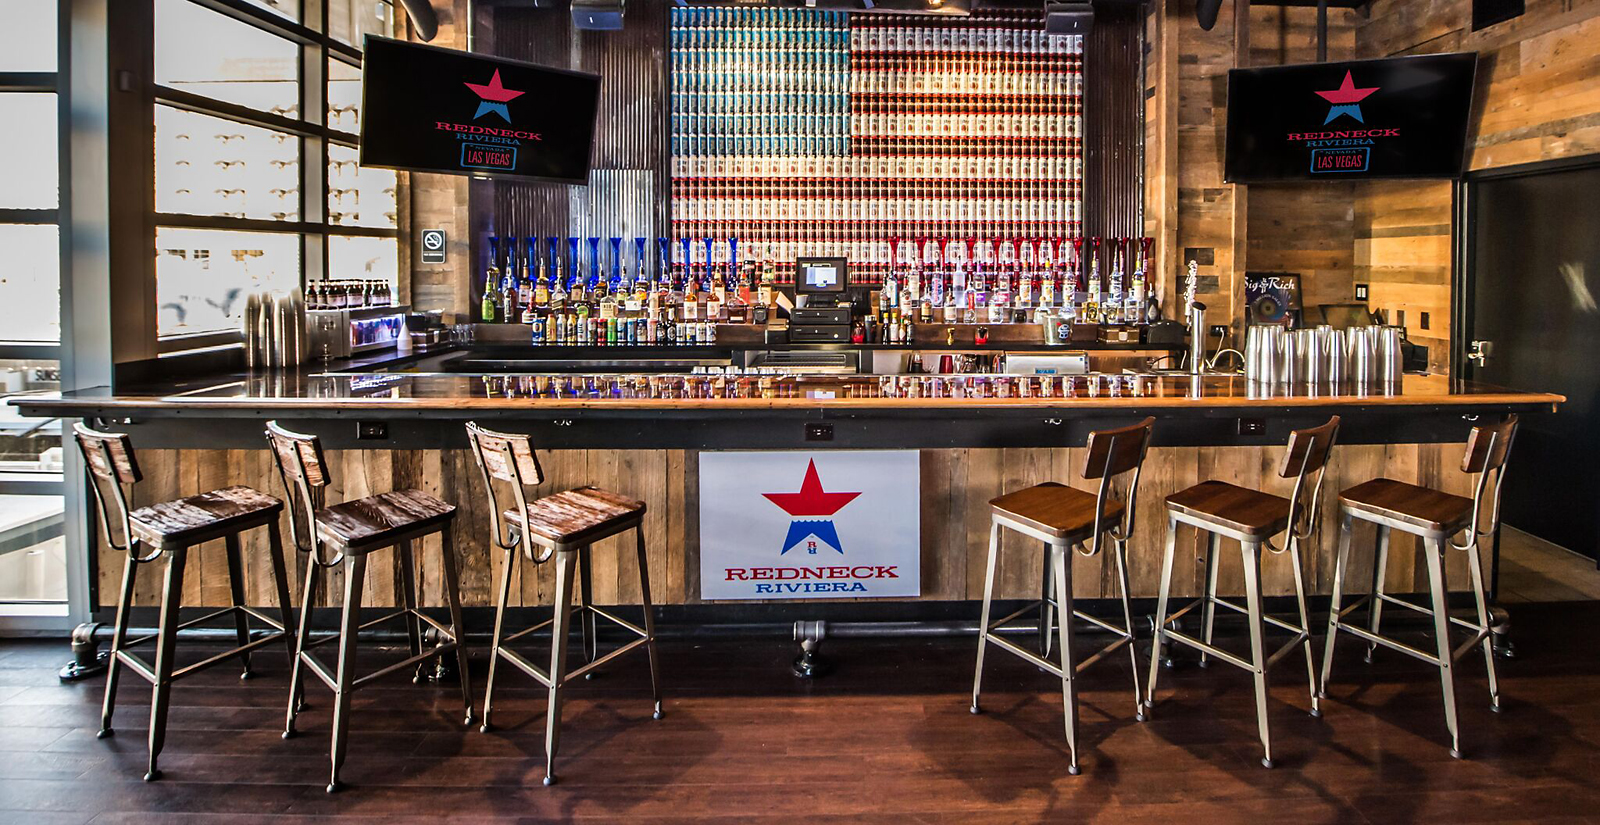 Redneck Riviera Heroes Bar